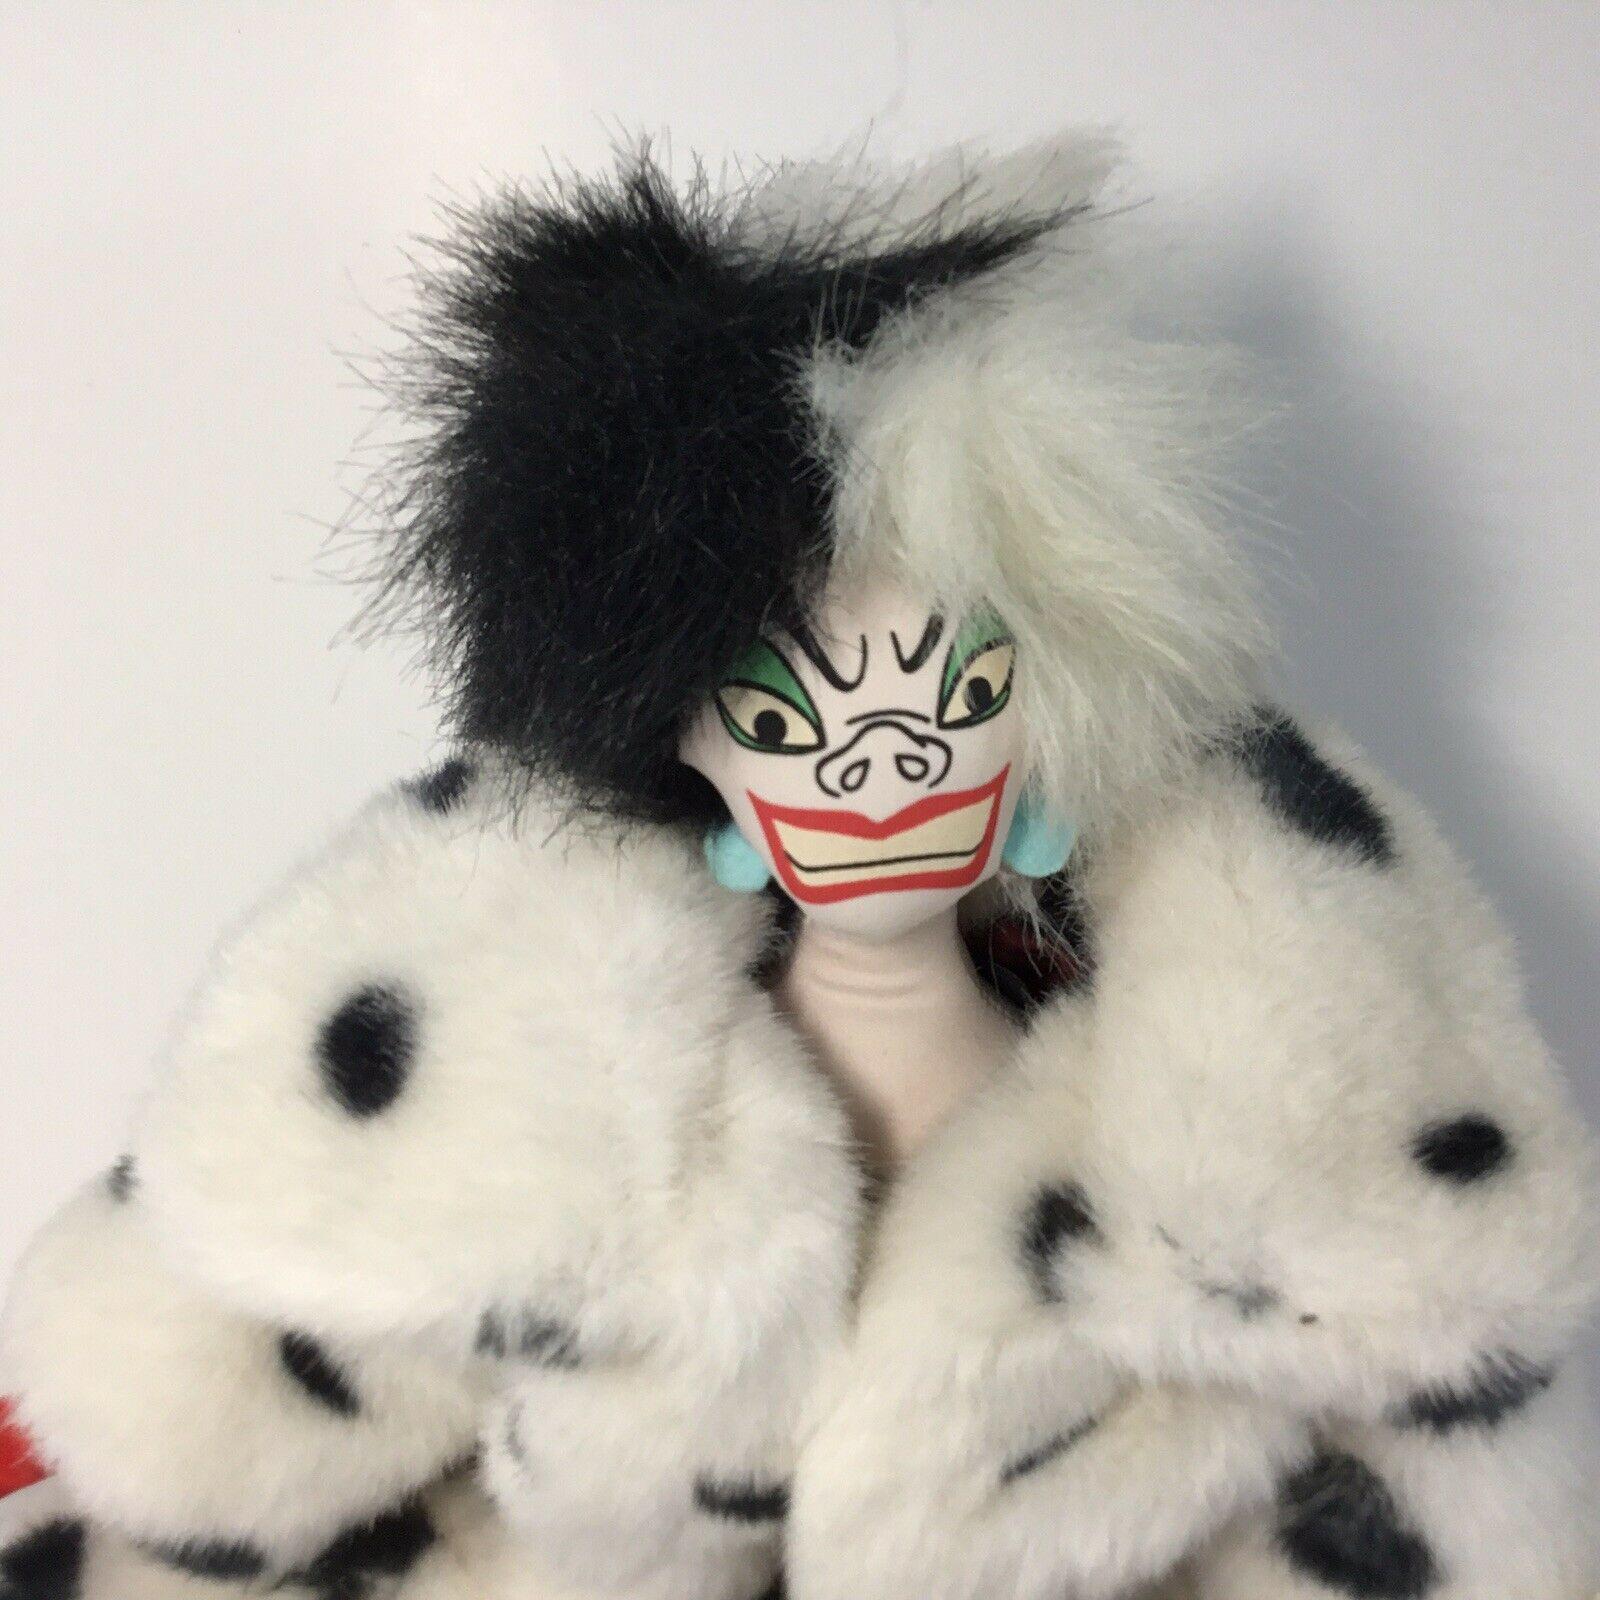 "Disney 101 Dalmatians Villain Plush CRUELLA DE VIL Doll -- 18"" H image 2"